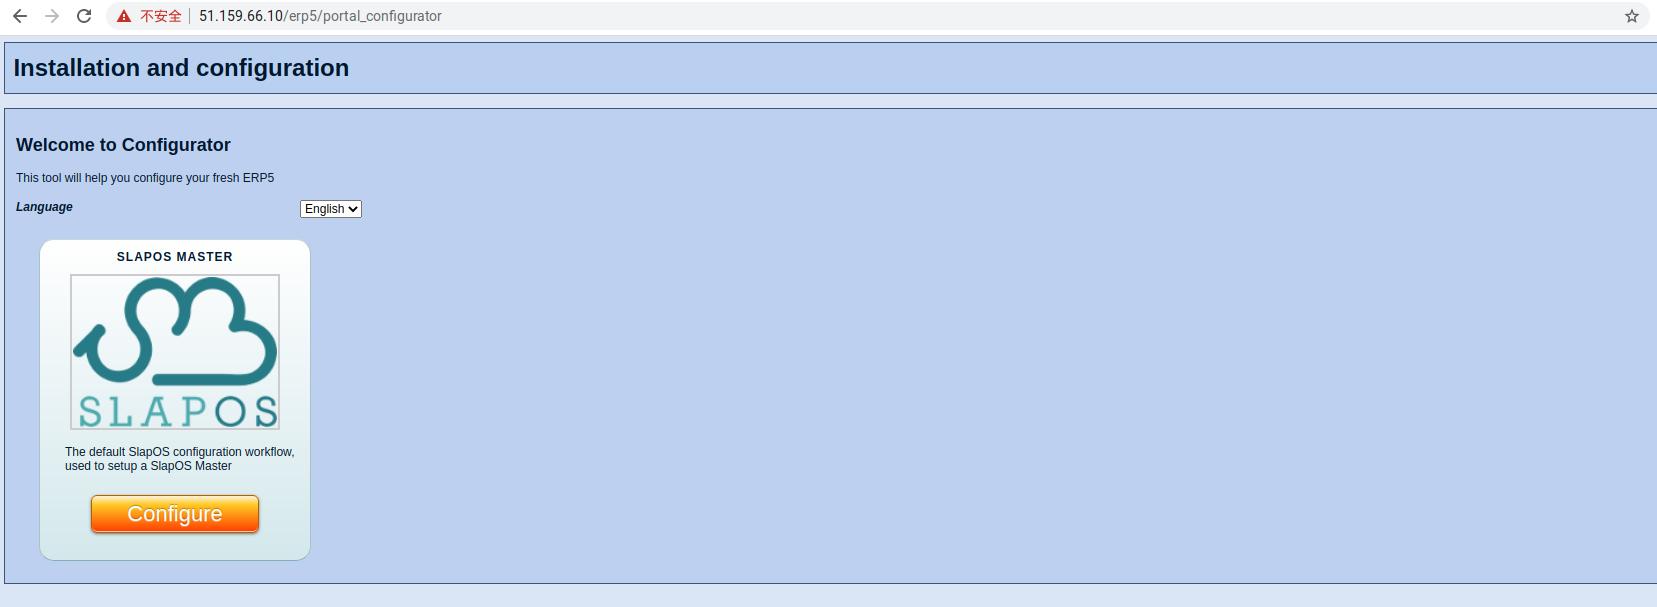 ERP5 Interface - Configurator Menu